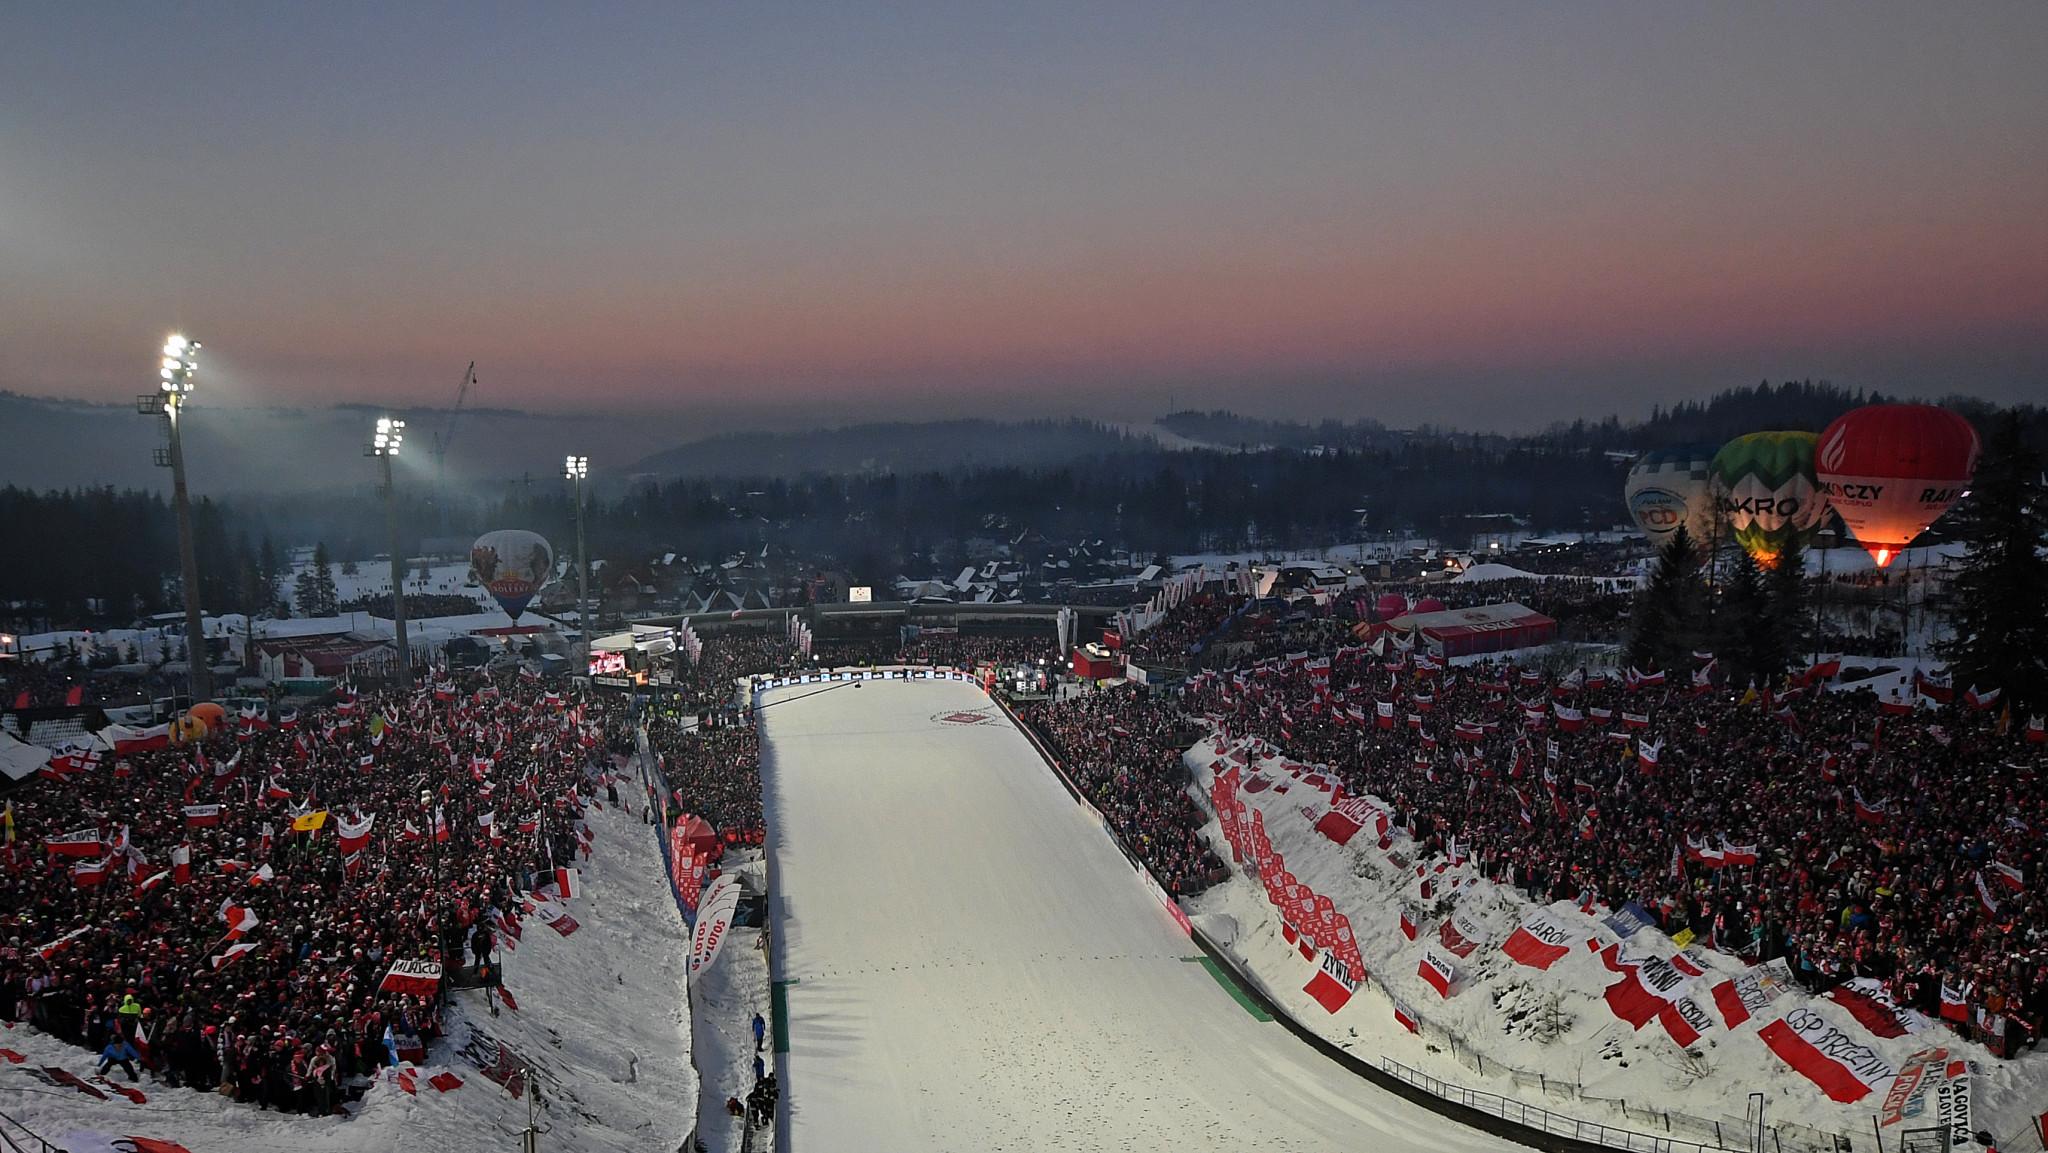 Zakopane will host the 2021 Nordic Junior World Ski Championships ©Getty Images